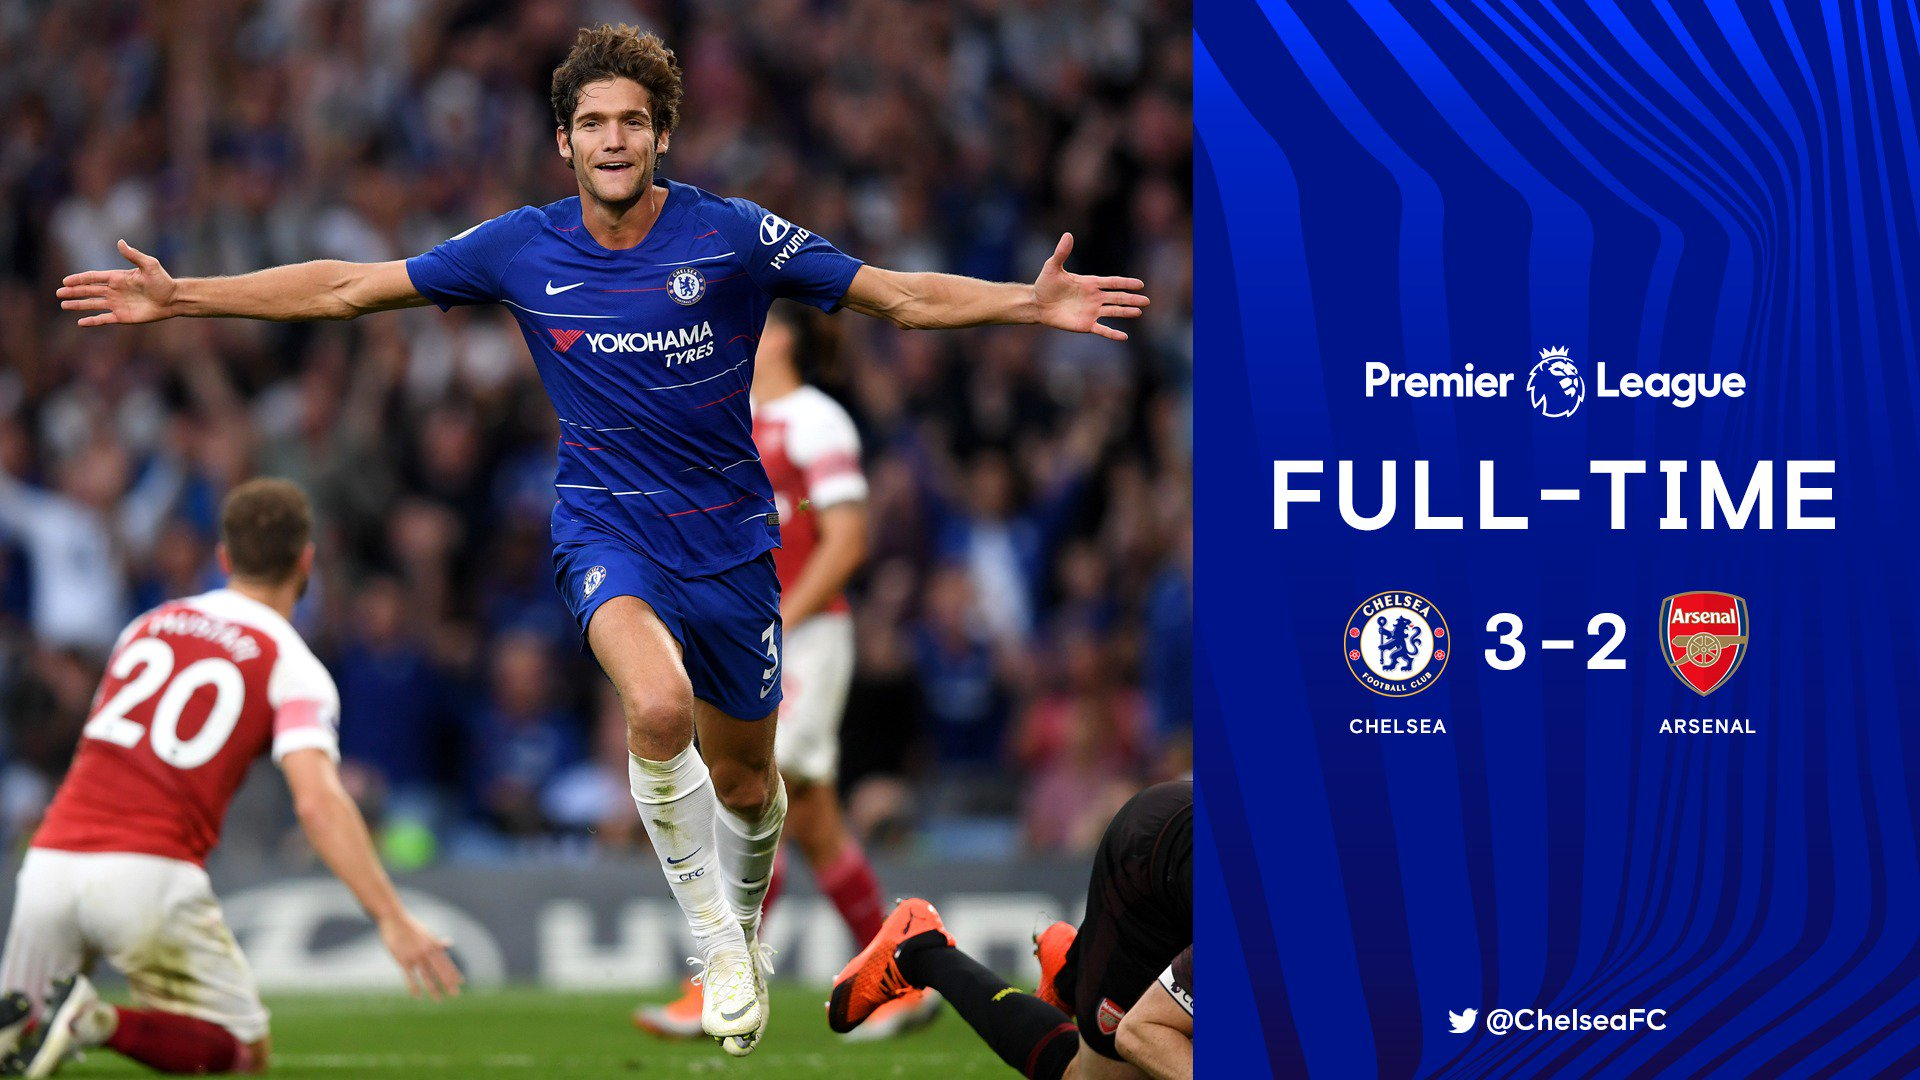 Chấm điểm Chelsea 3-2 Arsenal